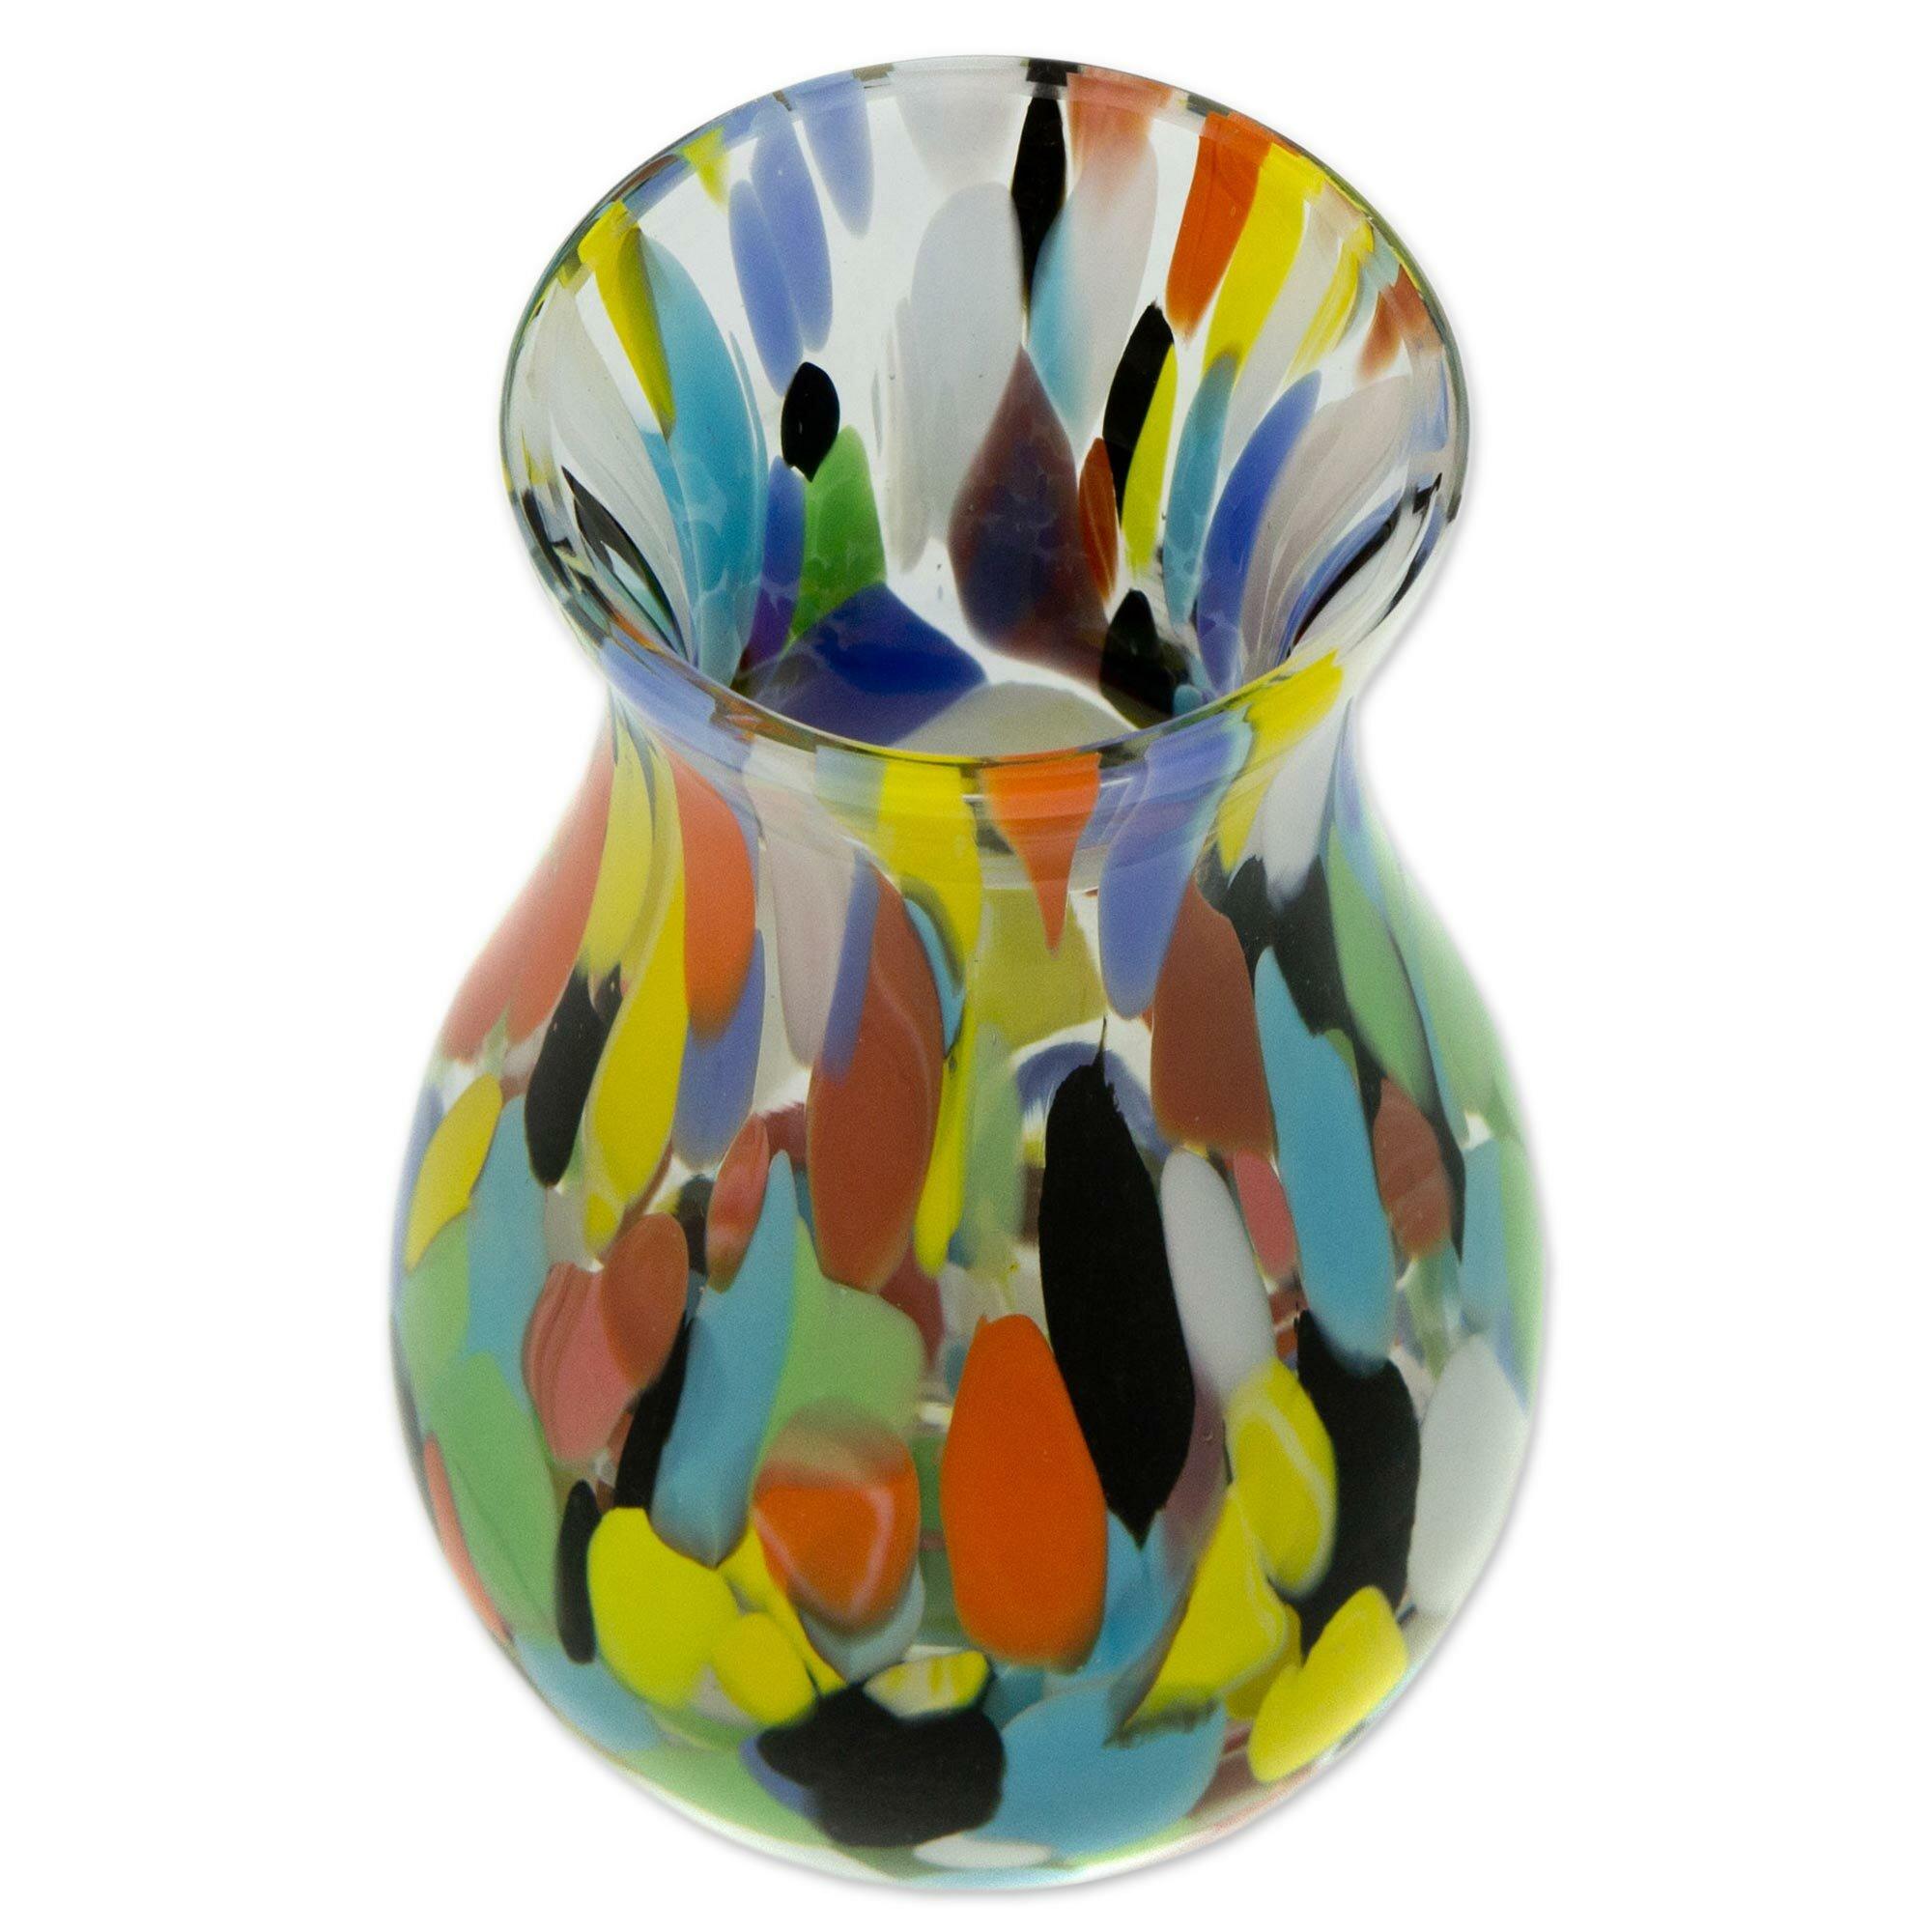 spring a vase art - photo #38